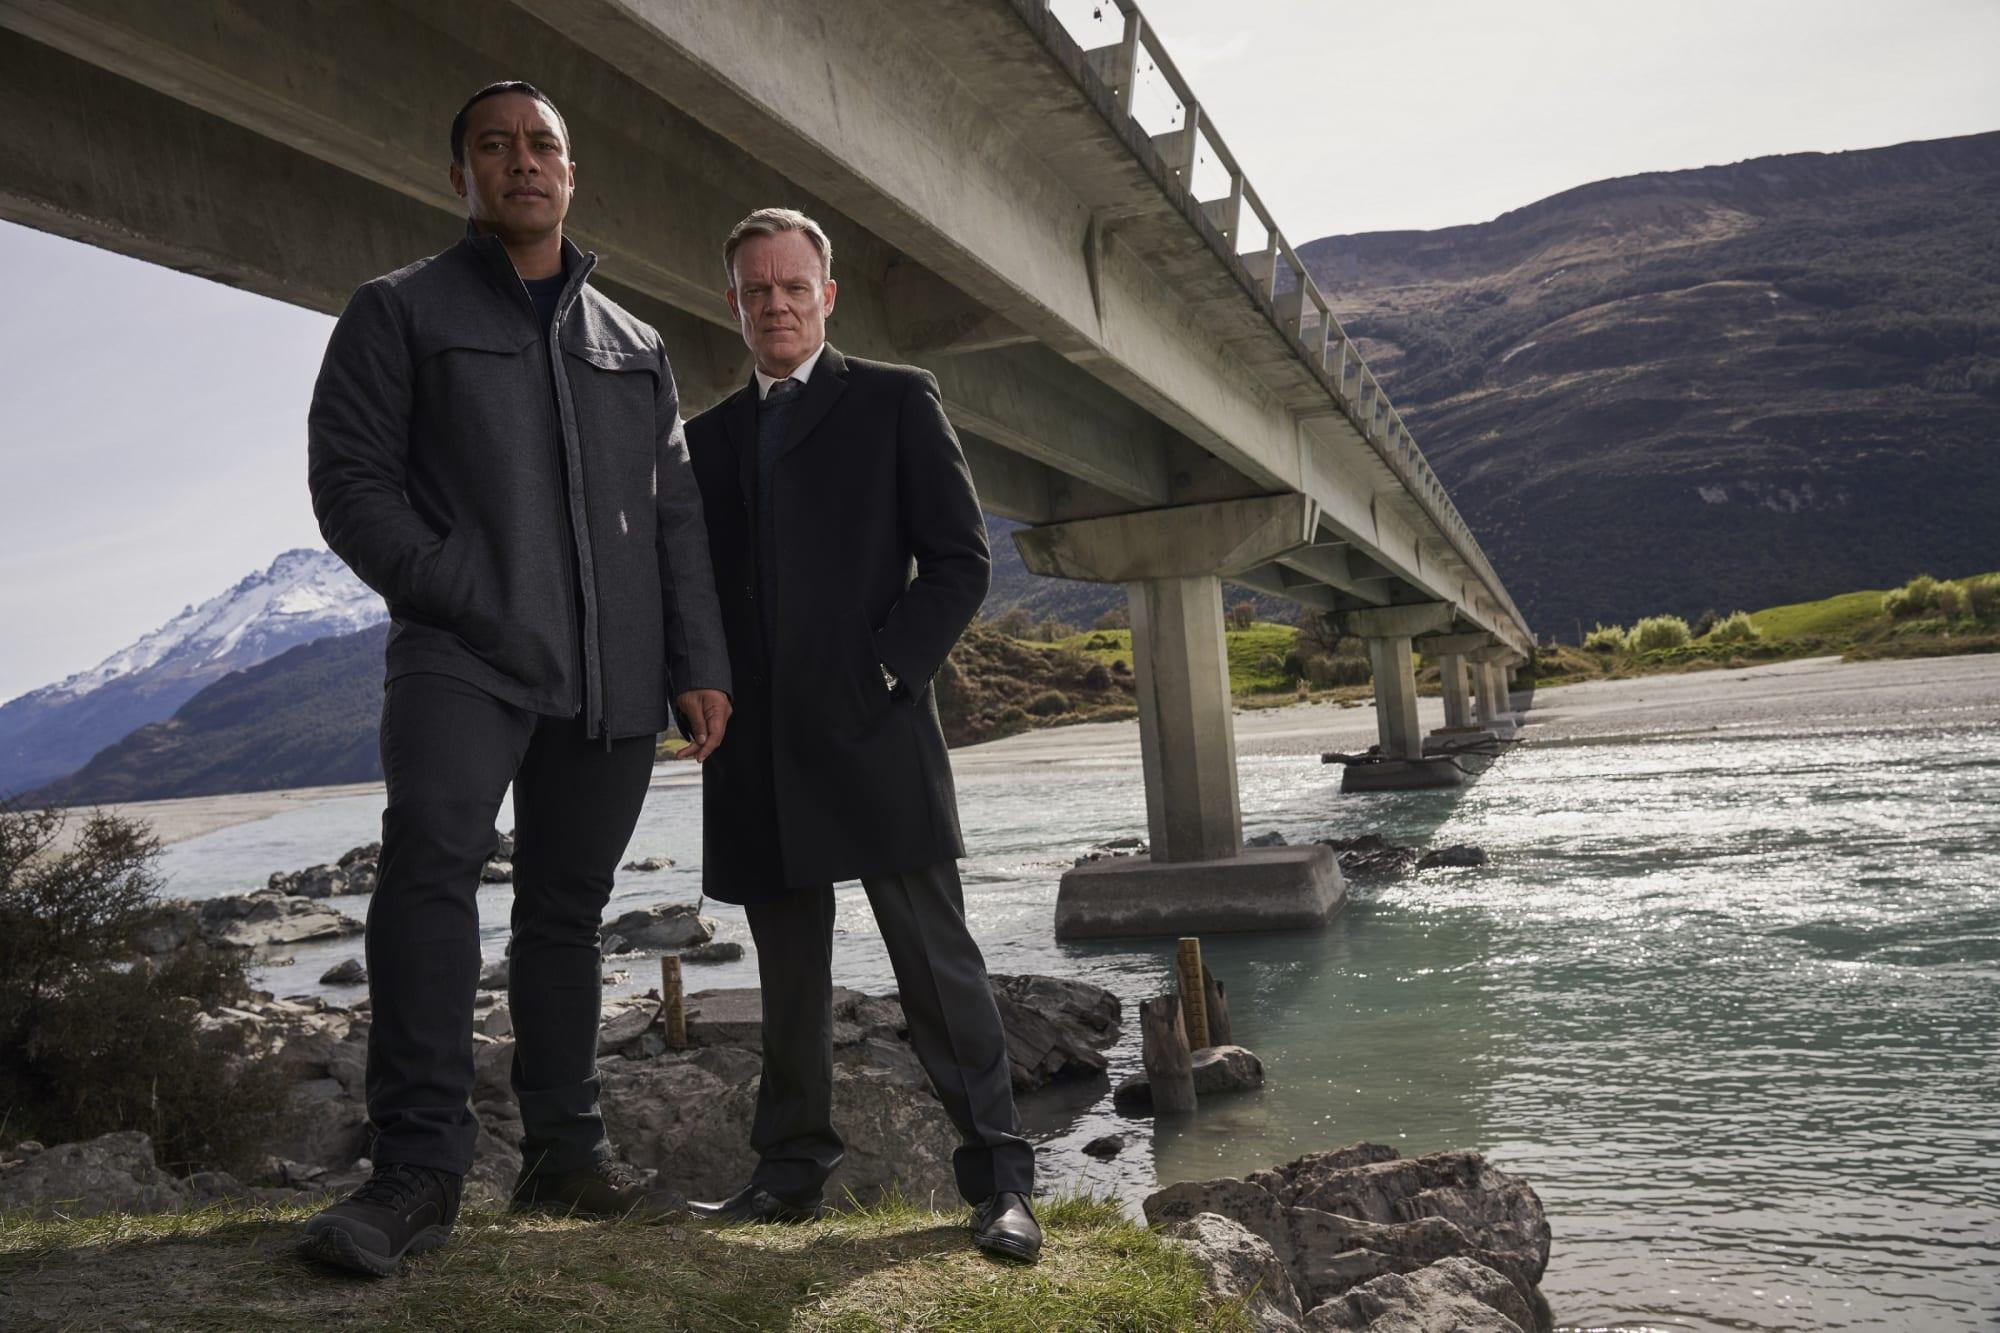 One Lane Bridge: Who wanted Grub dead?